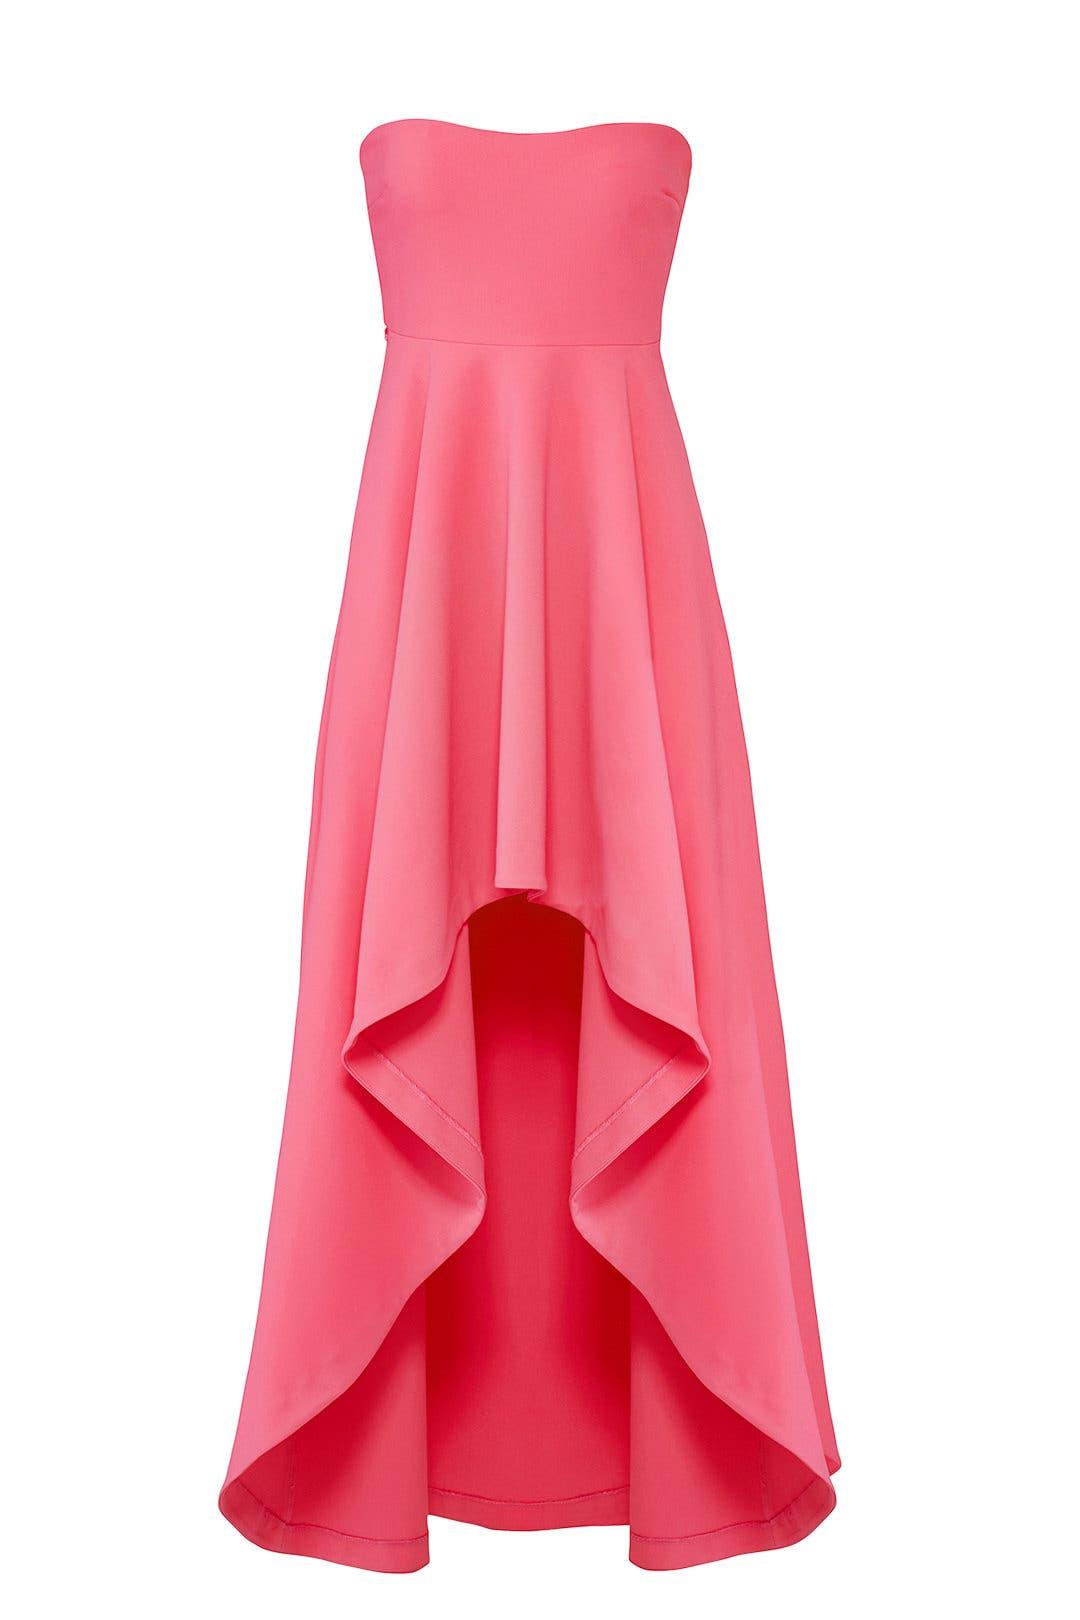 Excepcional Rent Wedding Dress Dc Ideas Ornamento Elaboración ...